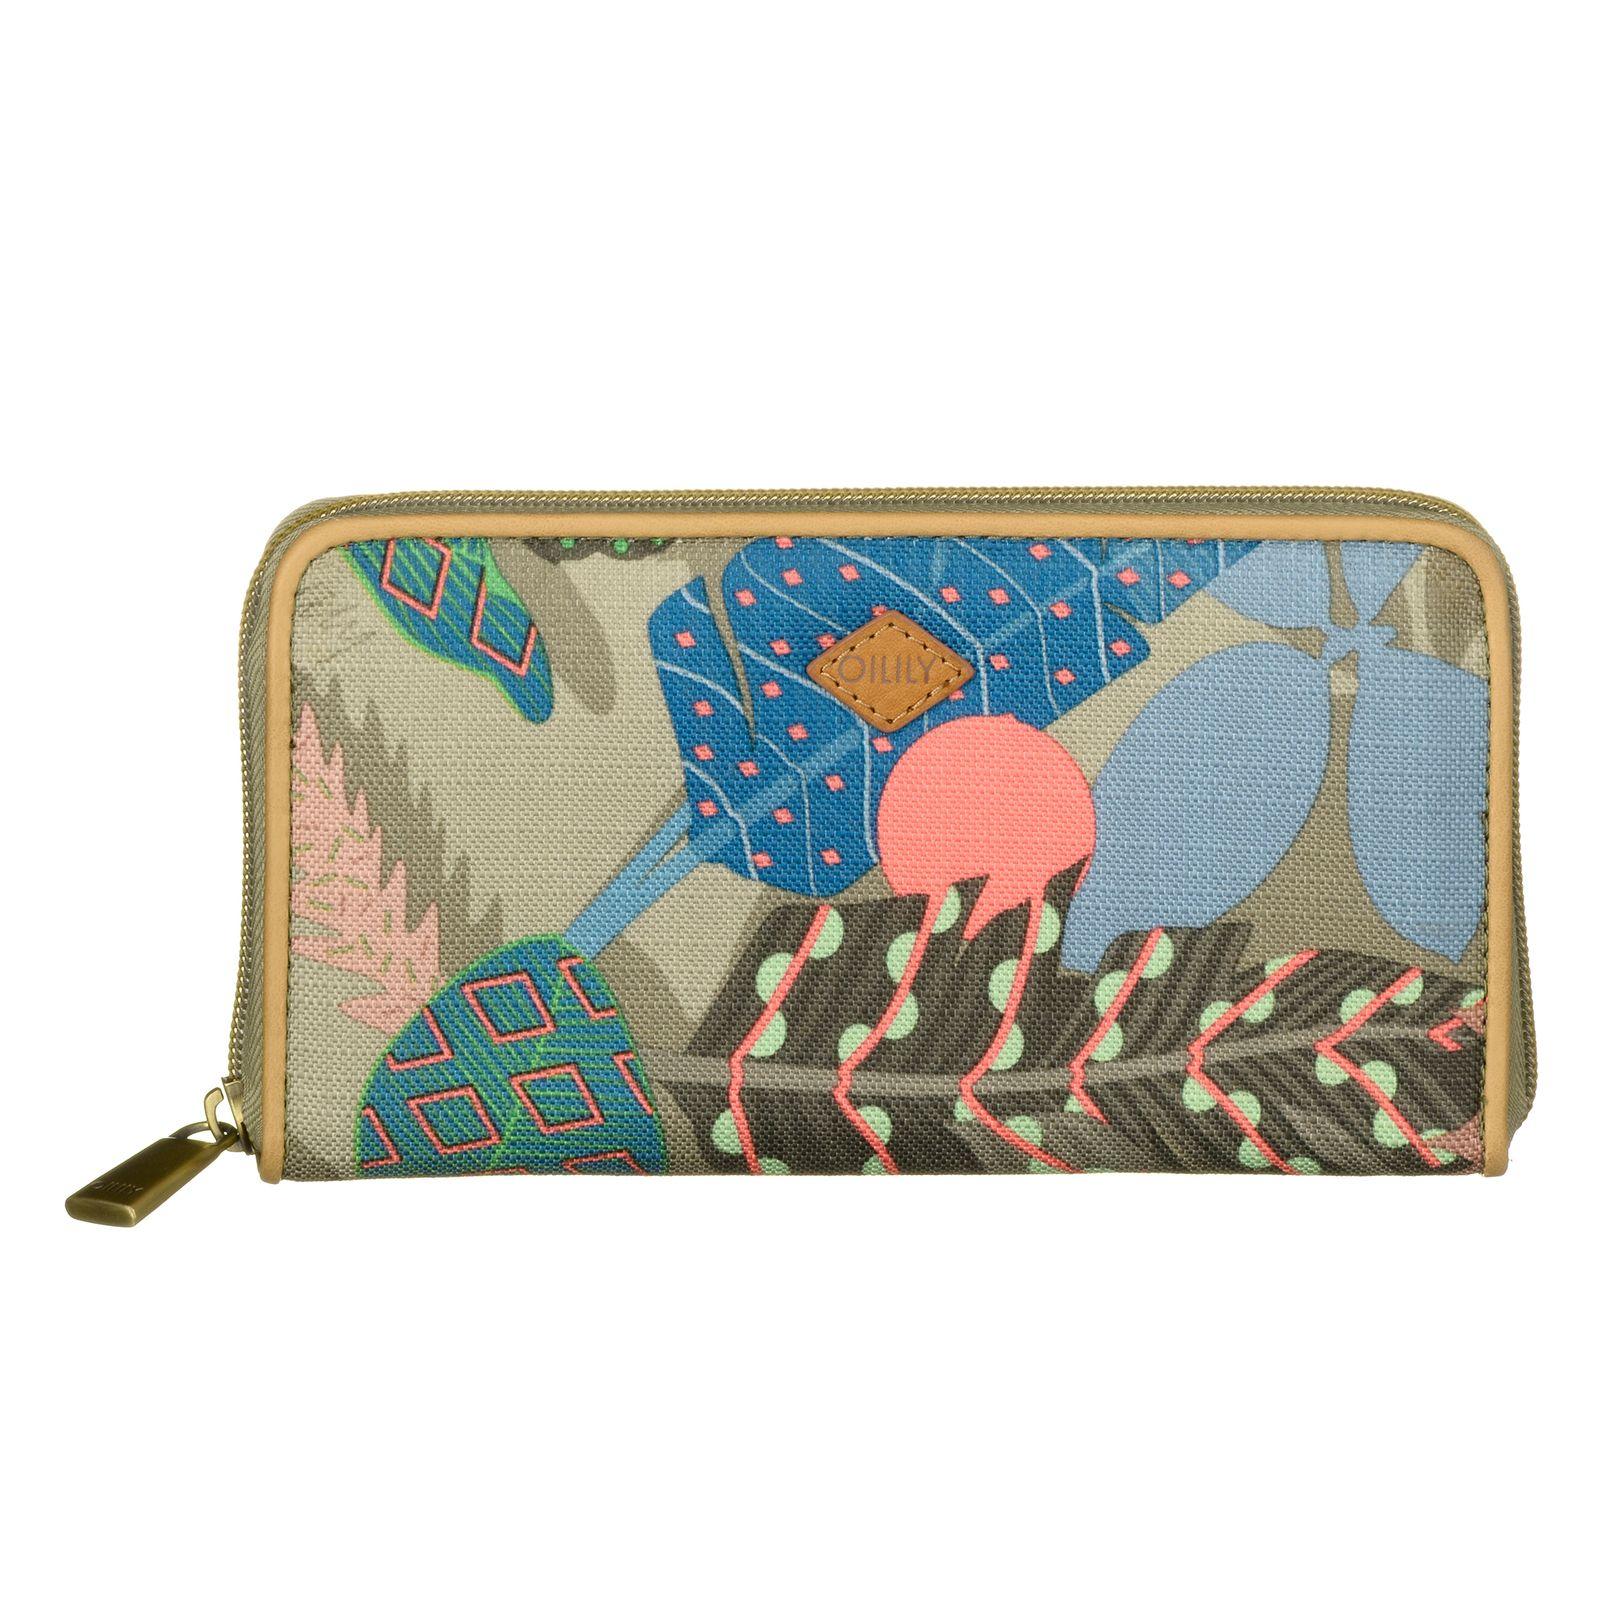 793950147519 Oilily Botanic Pop Zip Wallet L Nori Green